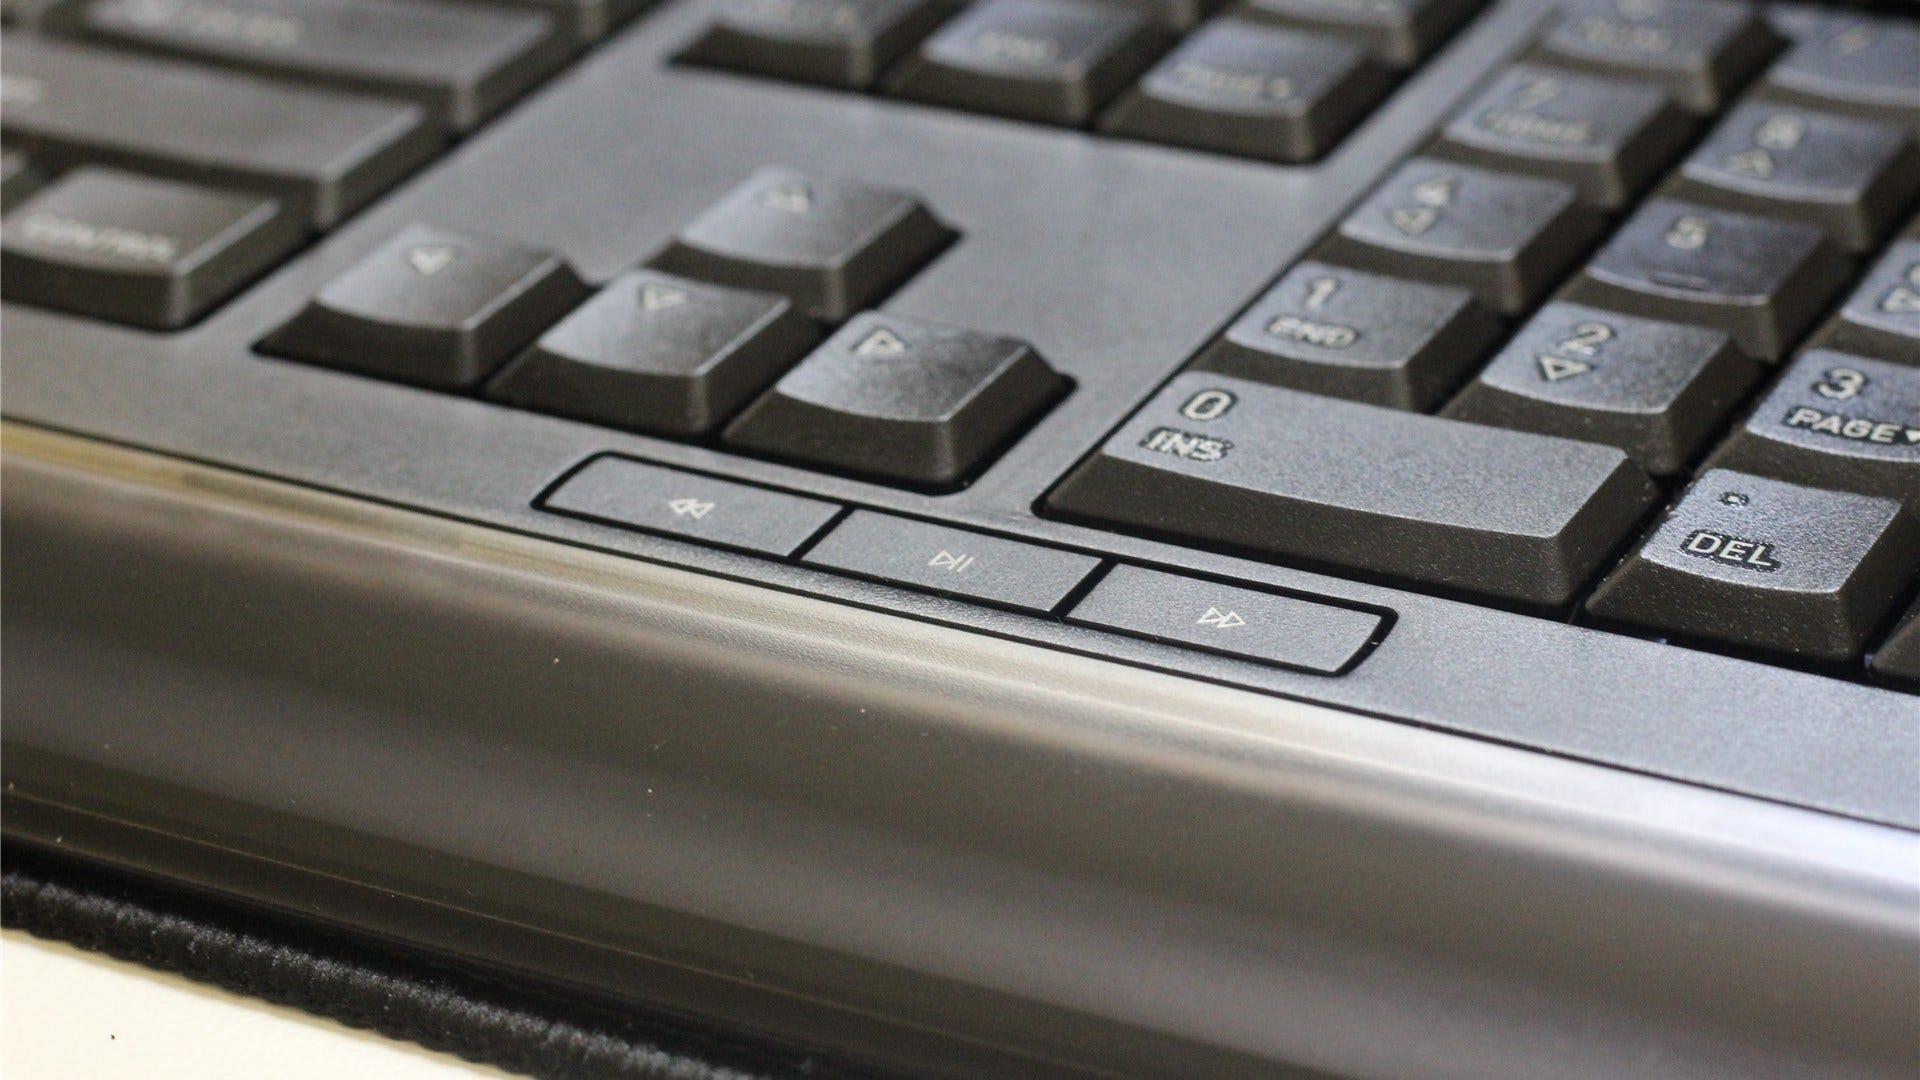 Gentix keyboard multimedia controls